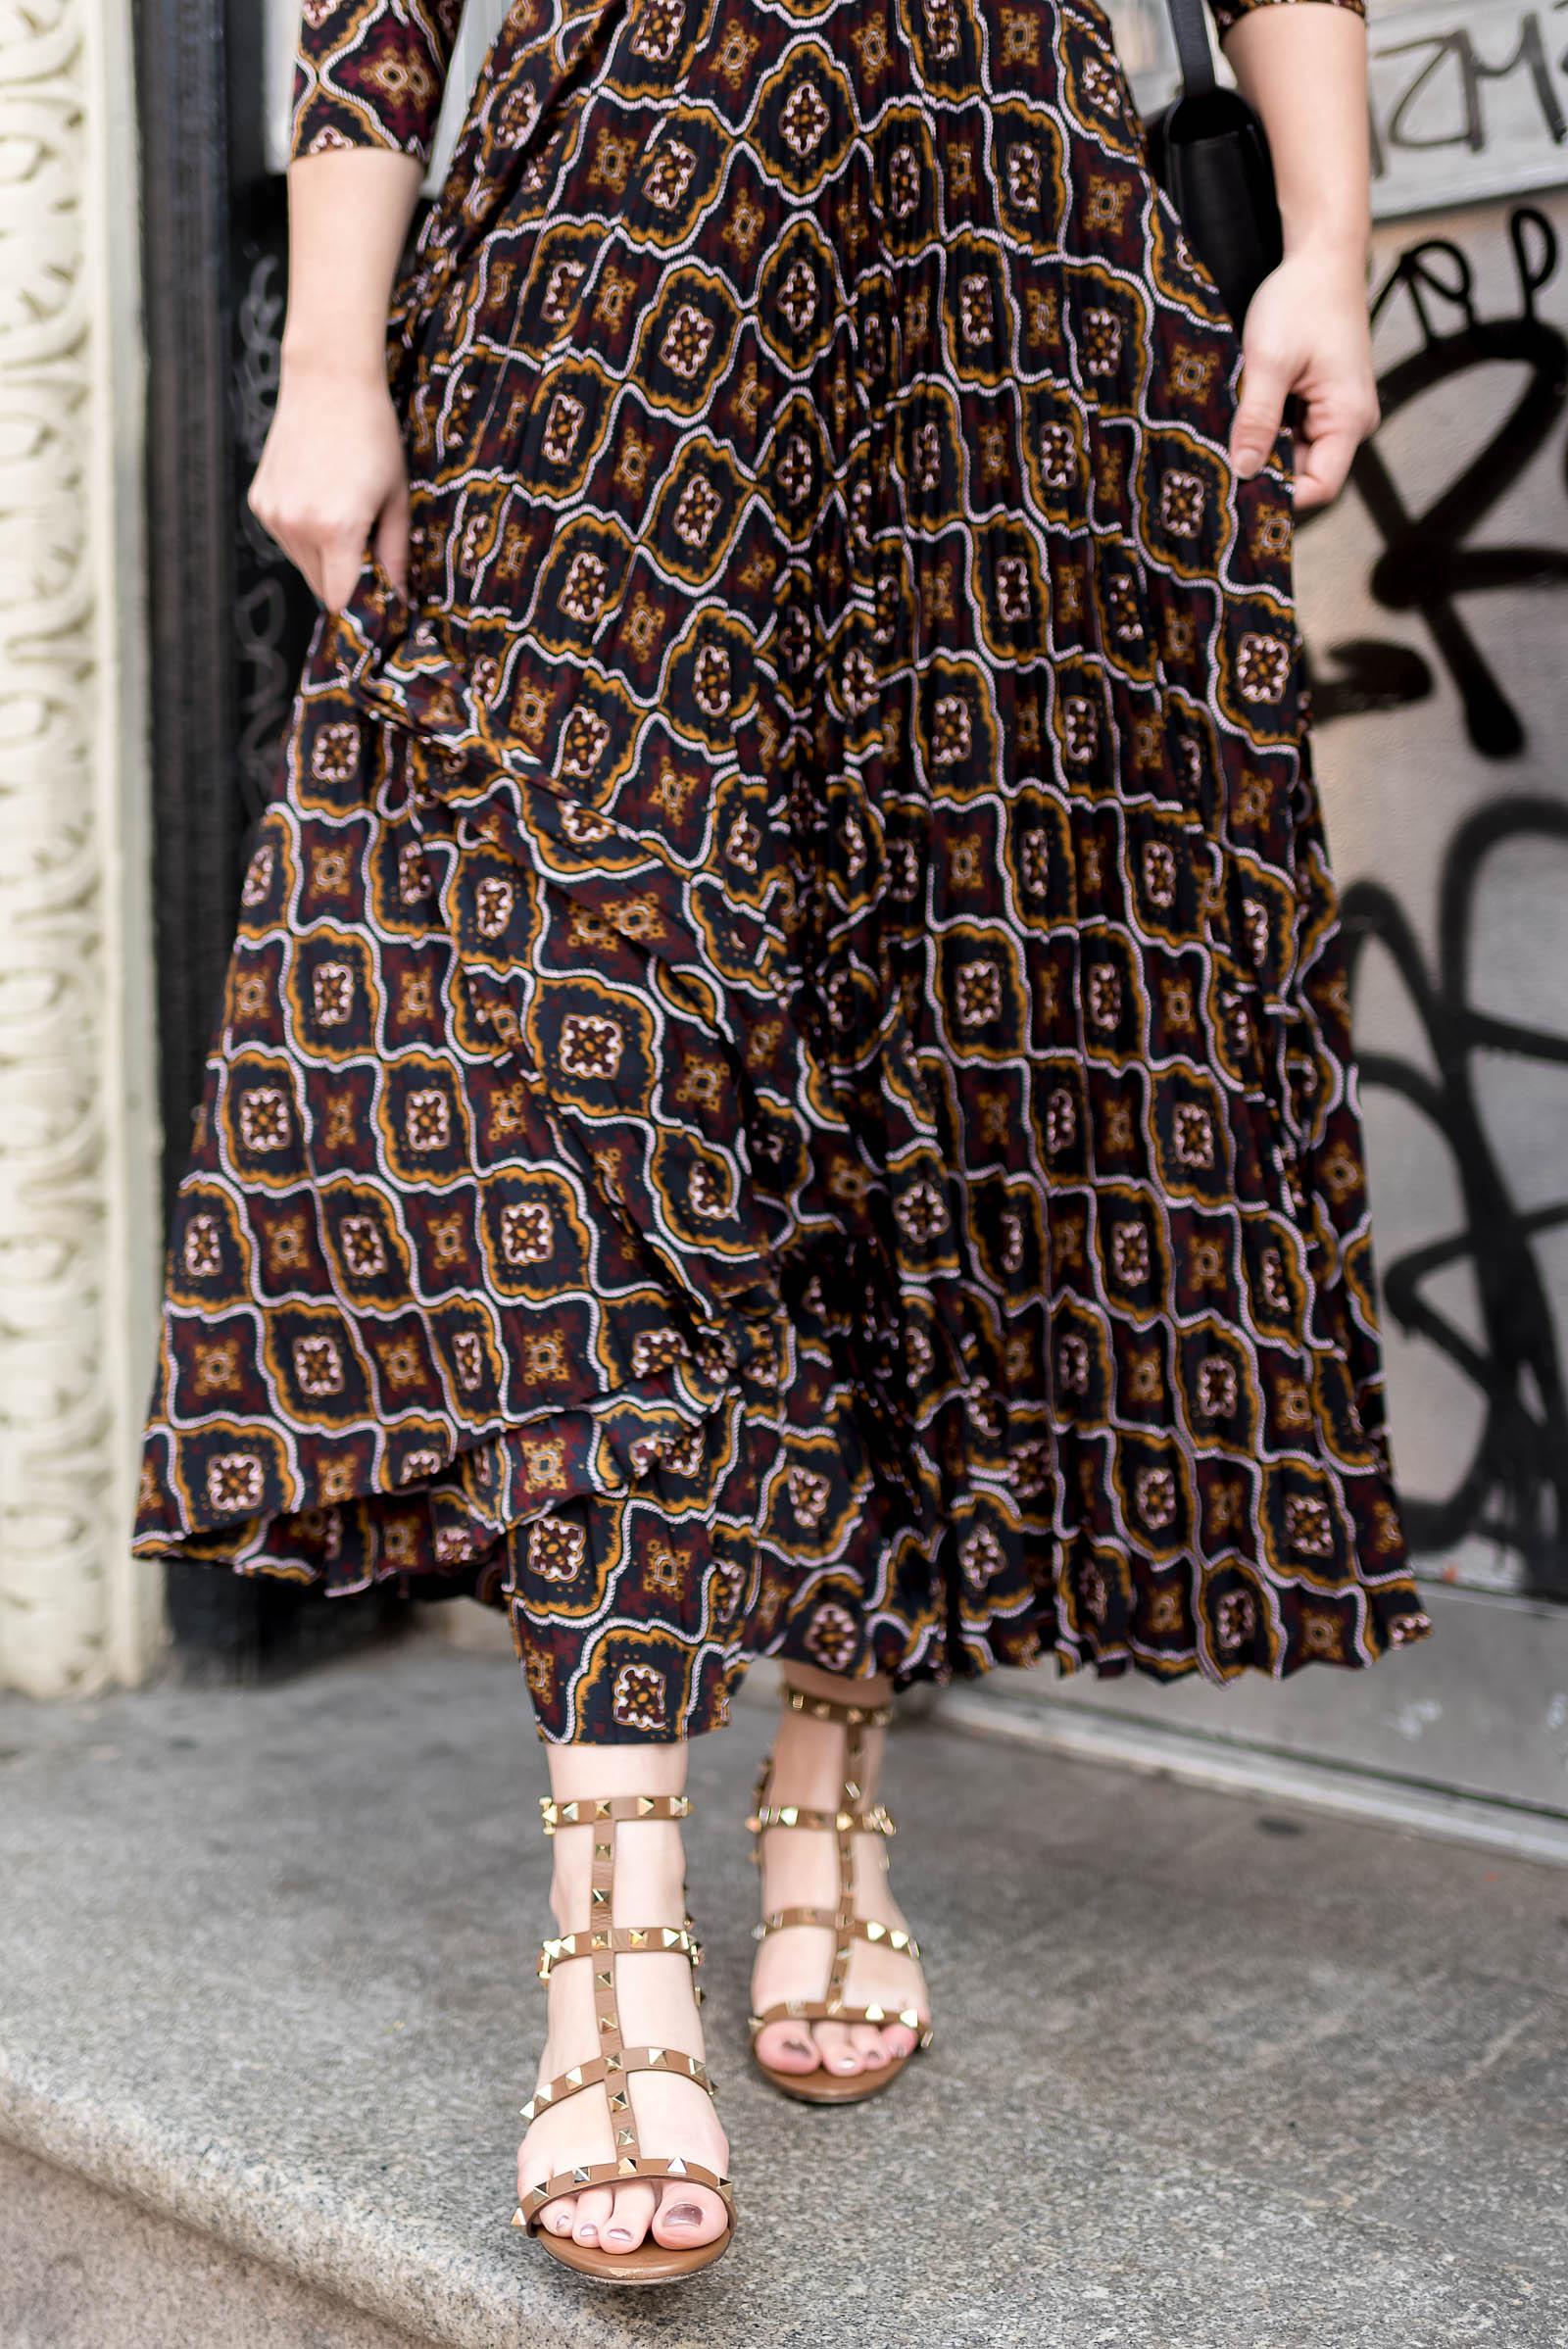 ALC NYFW Dress Celine Box Bag Valentino Sandals